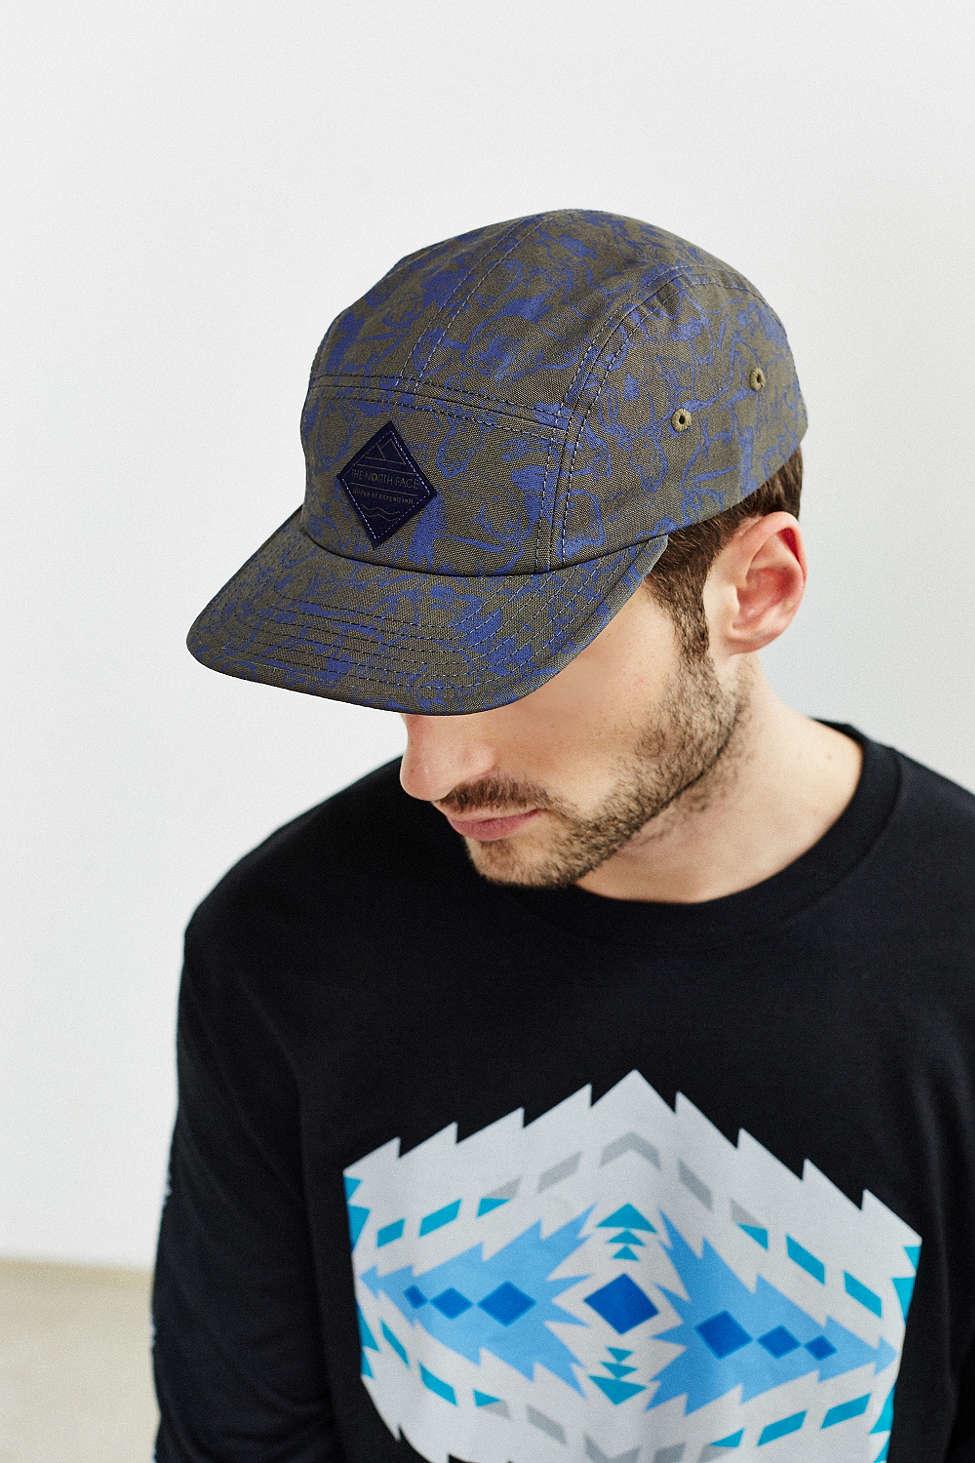 08466a571dfa9e The North Face 5-panel Baseball Hat in Black - Lyst